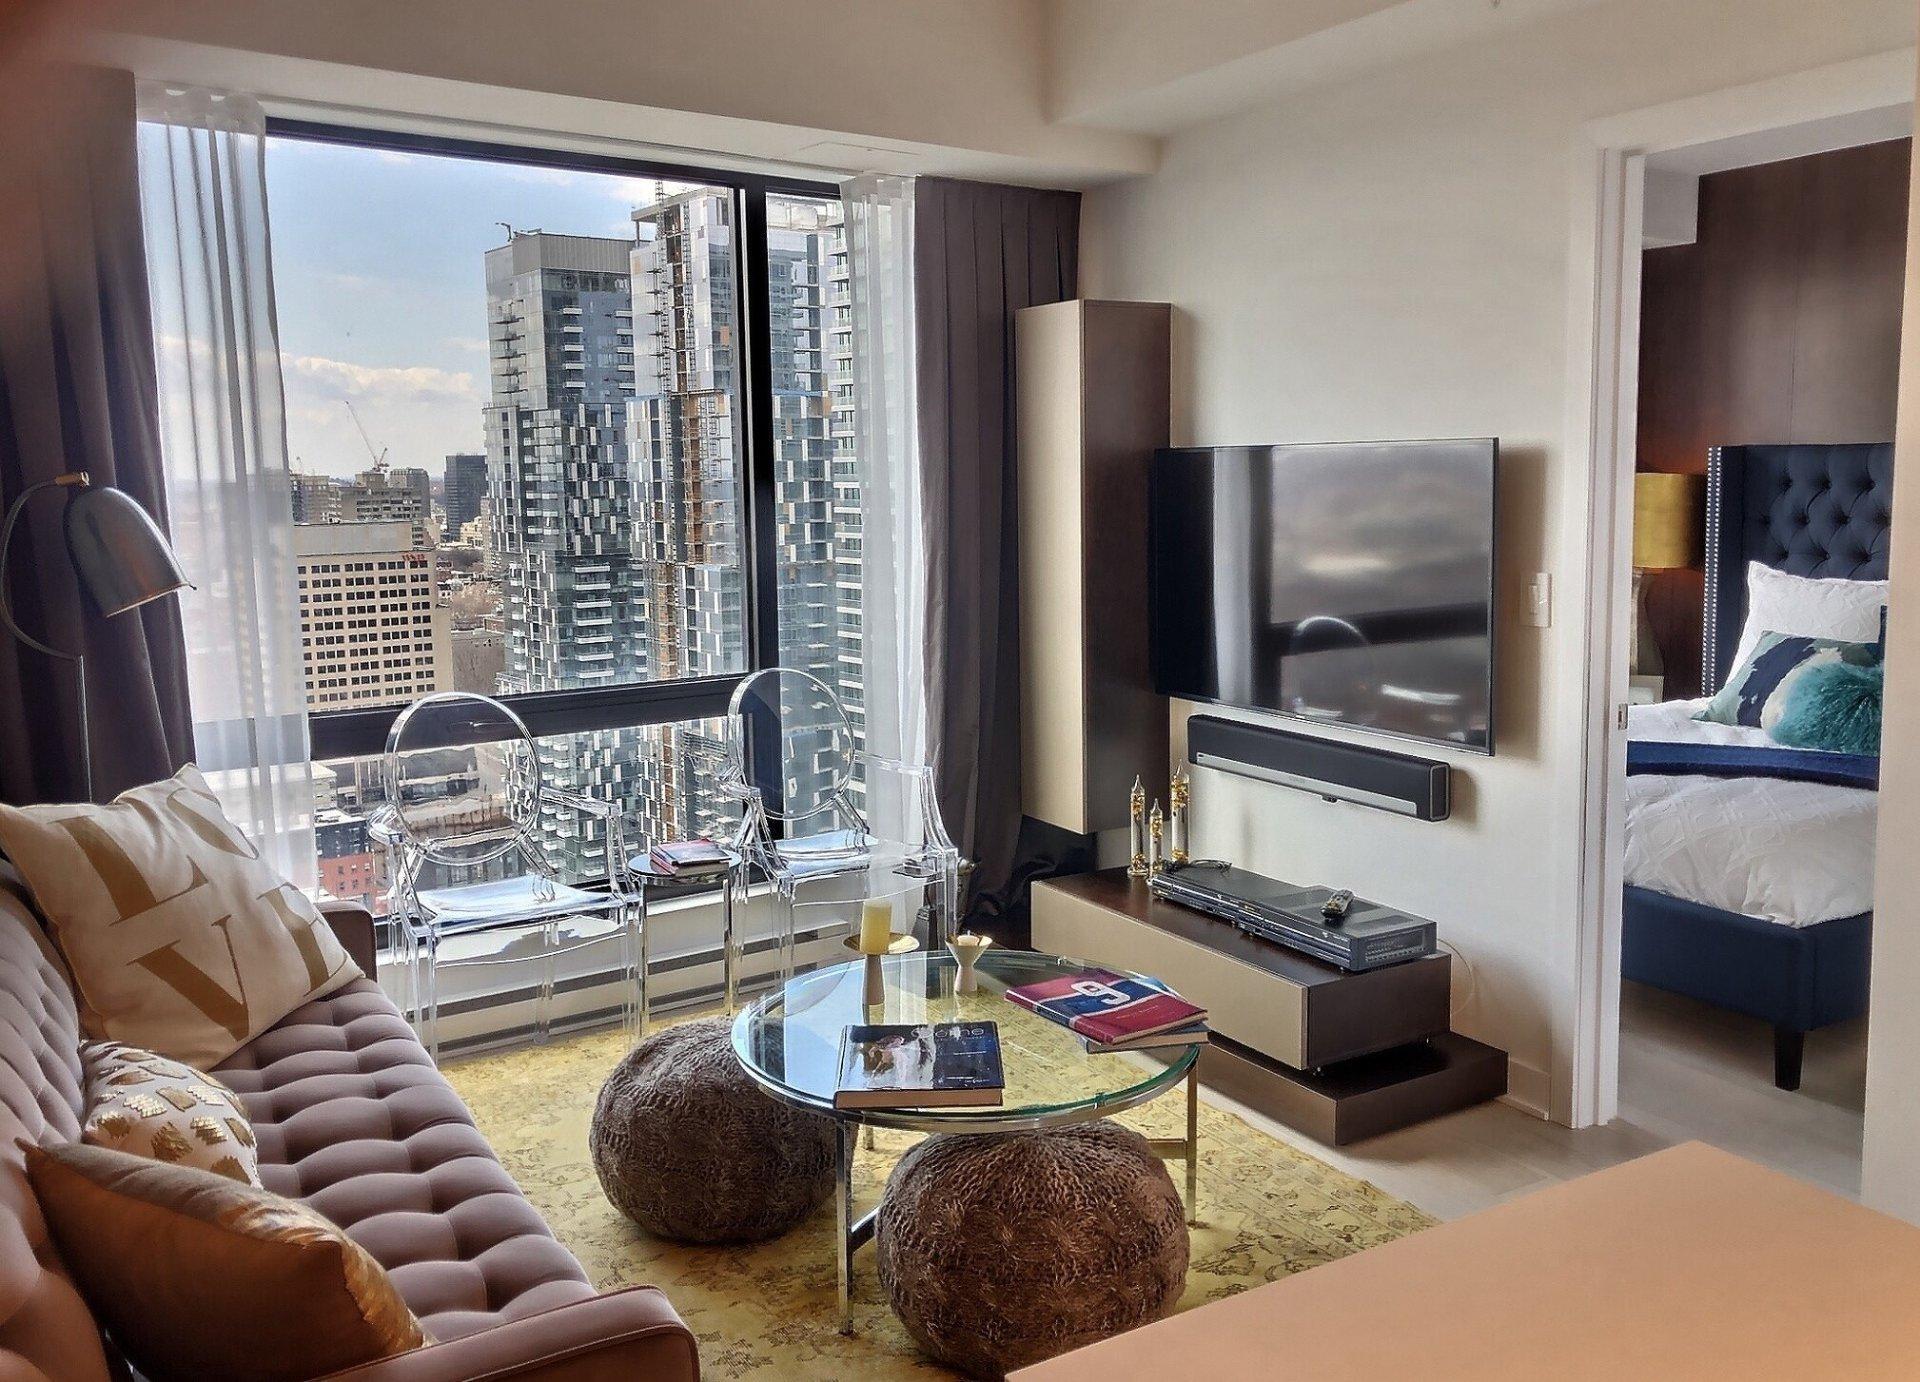 acheter appartement montreal